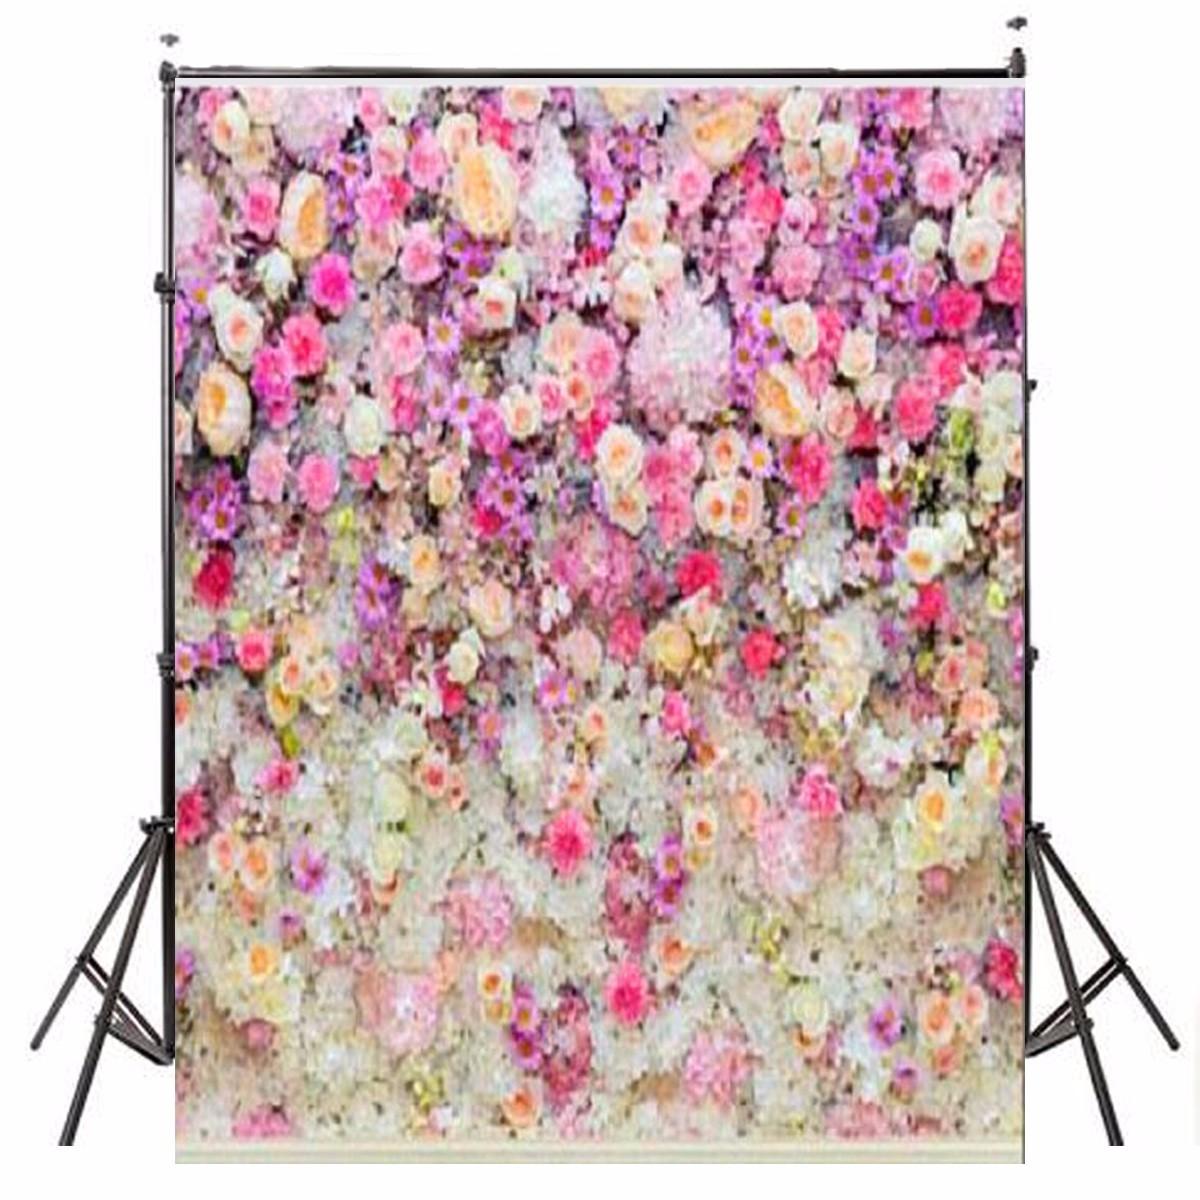 3x5ft flower wood wall vinyl background photography photo studio props - 5x7ft Flower Wall Wood Floor Backdrop Studio Props Vinyl